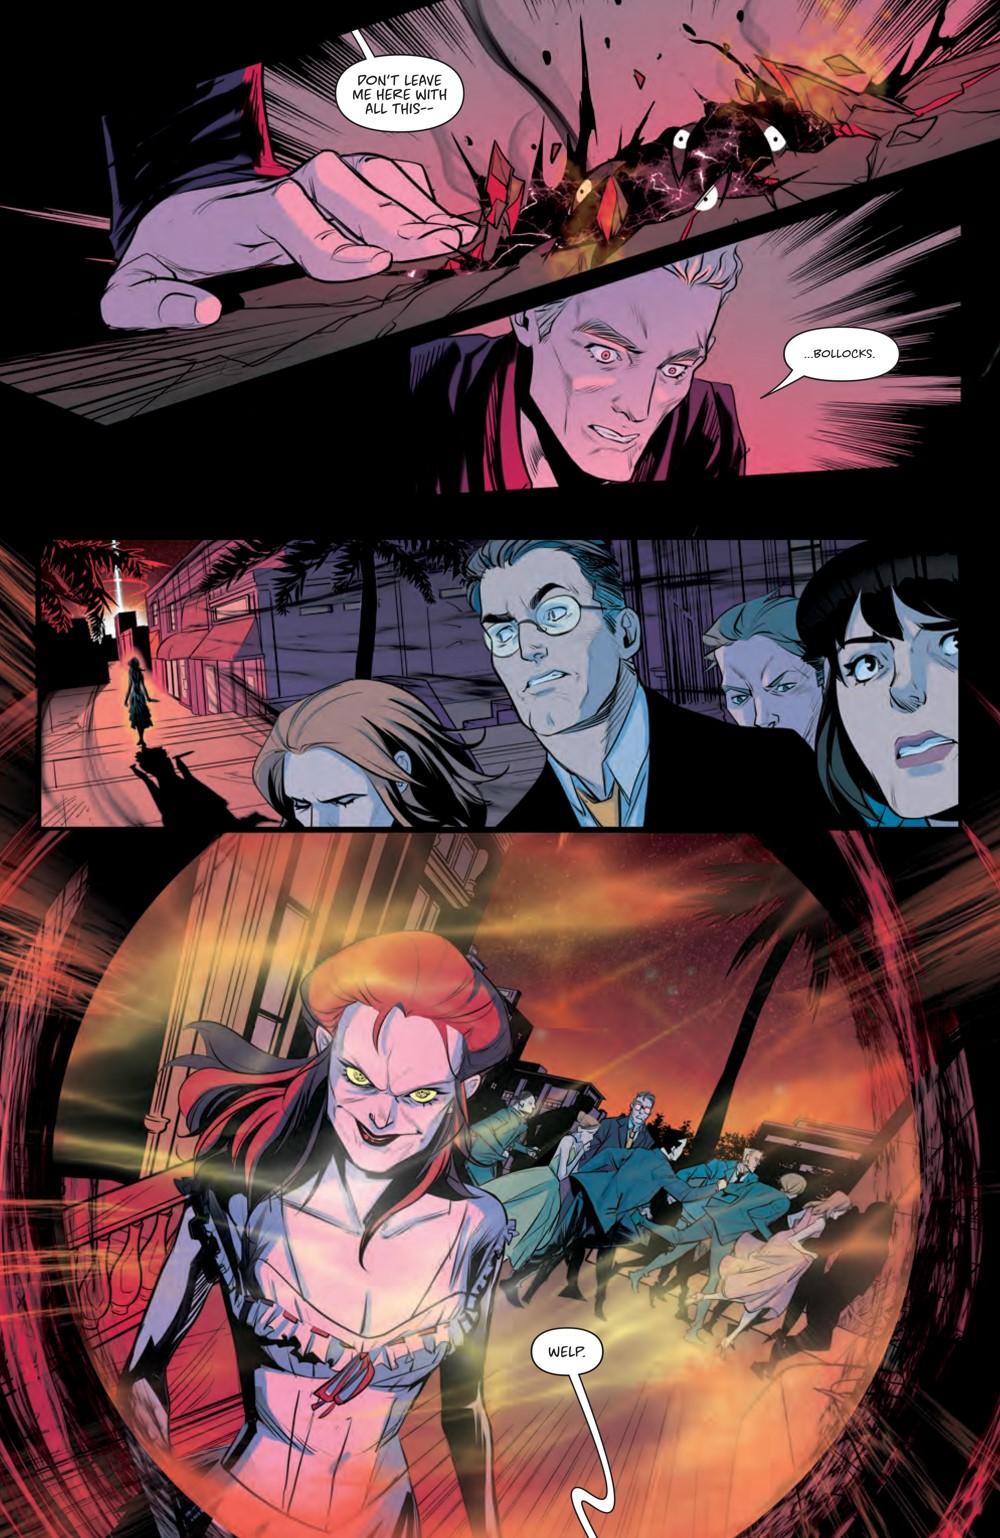 Hellmouth_SC_PRESS_11 ComicList Previews: BUFFY THE VAMPIRE SLAYER HELLMOUTH TP